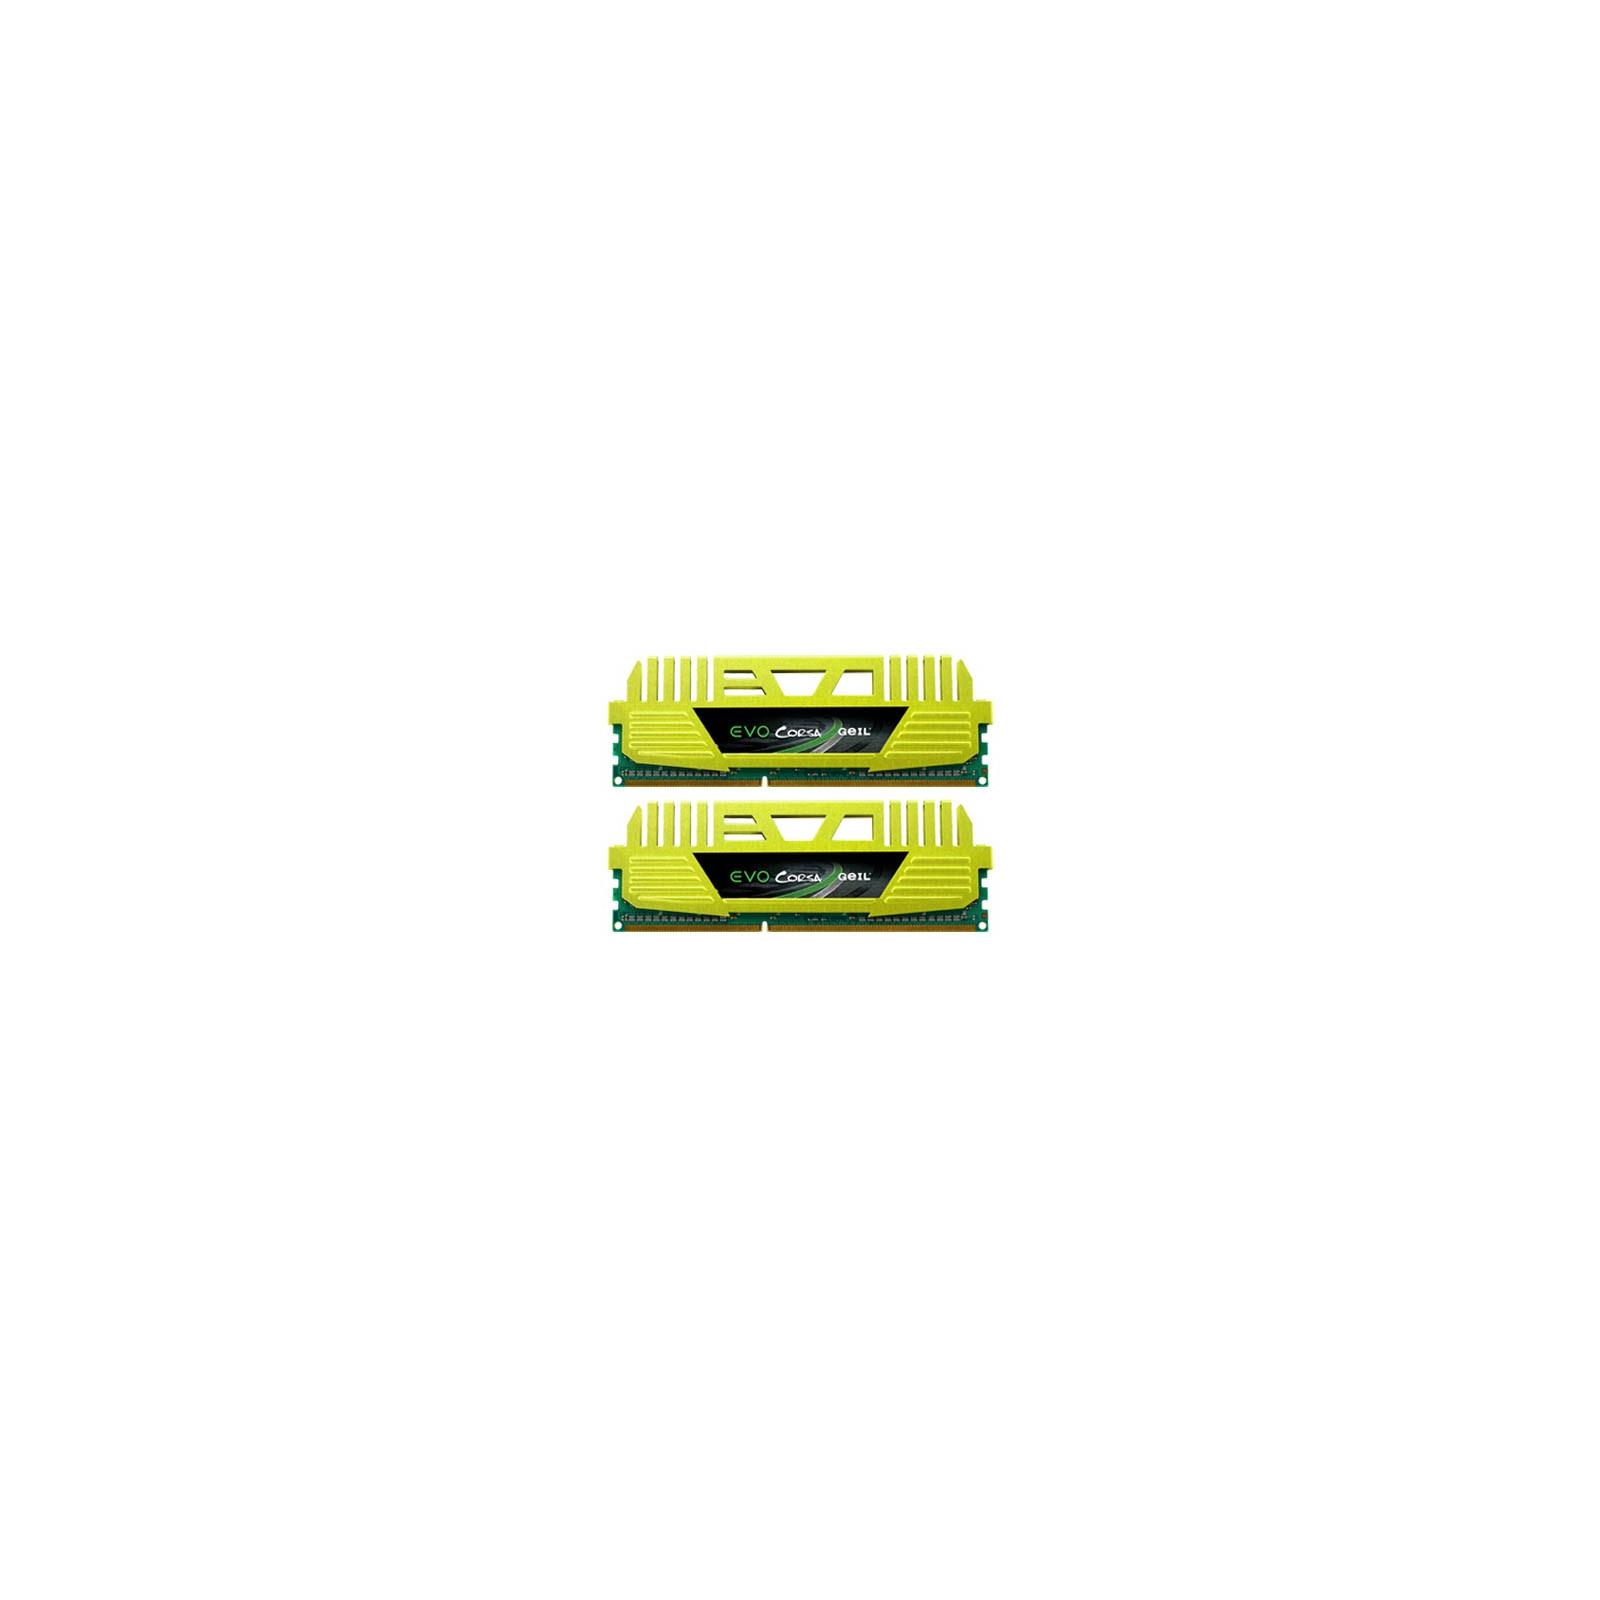 Модуль памяти для компьютера DDR3 16GB (2x8GB) 1600 MHz GEIL (GOC316GB1600C9DC)